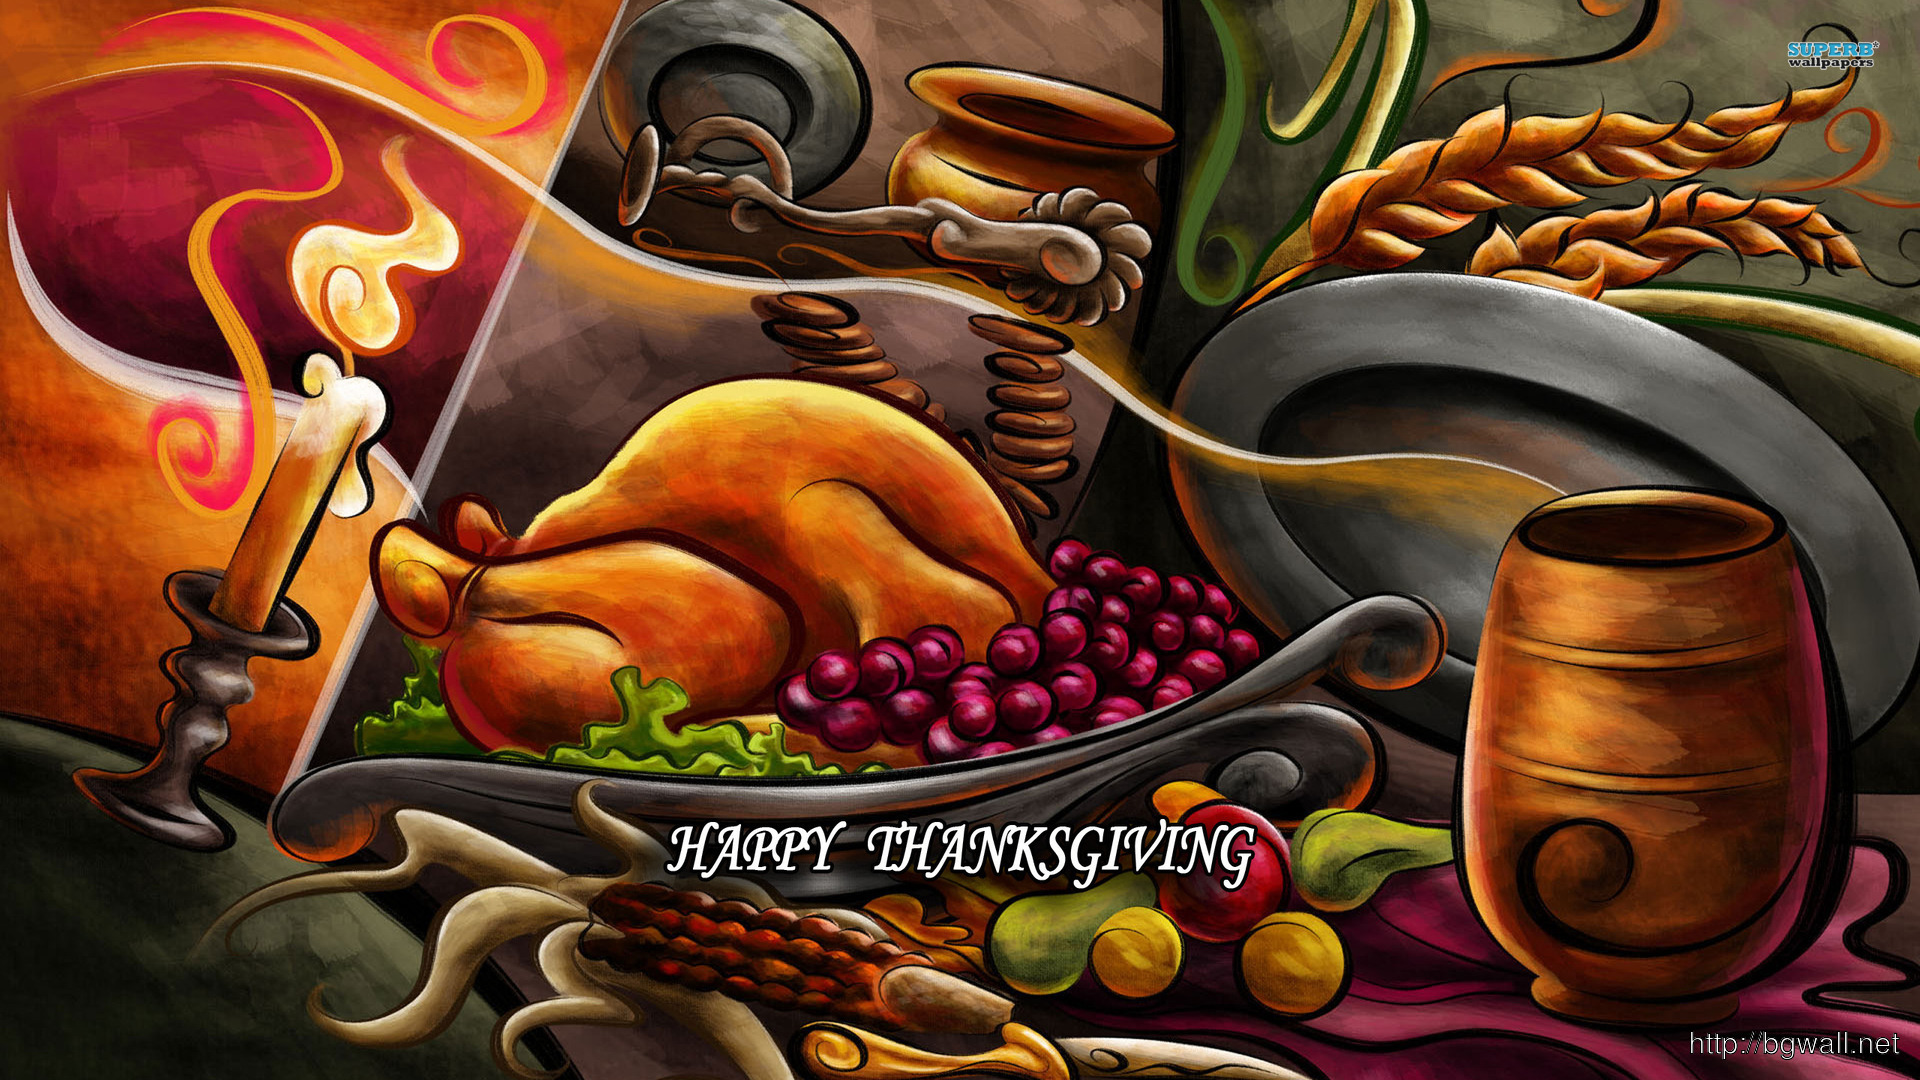 Happy Thanksgiving Wallpaper Full Size